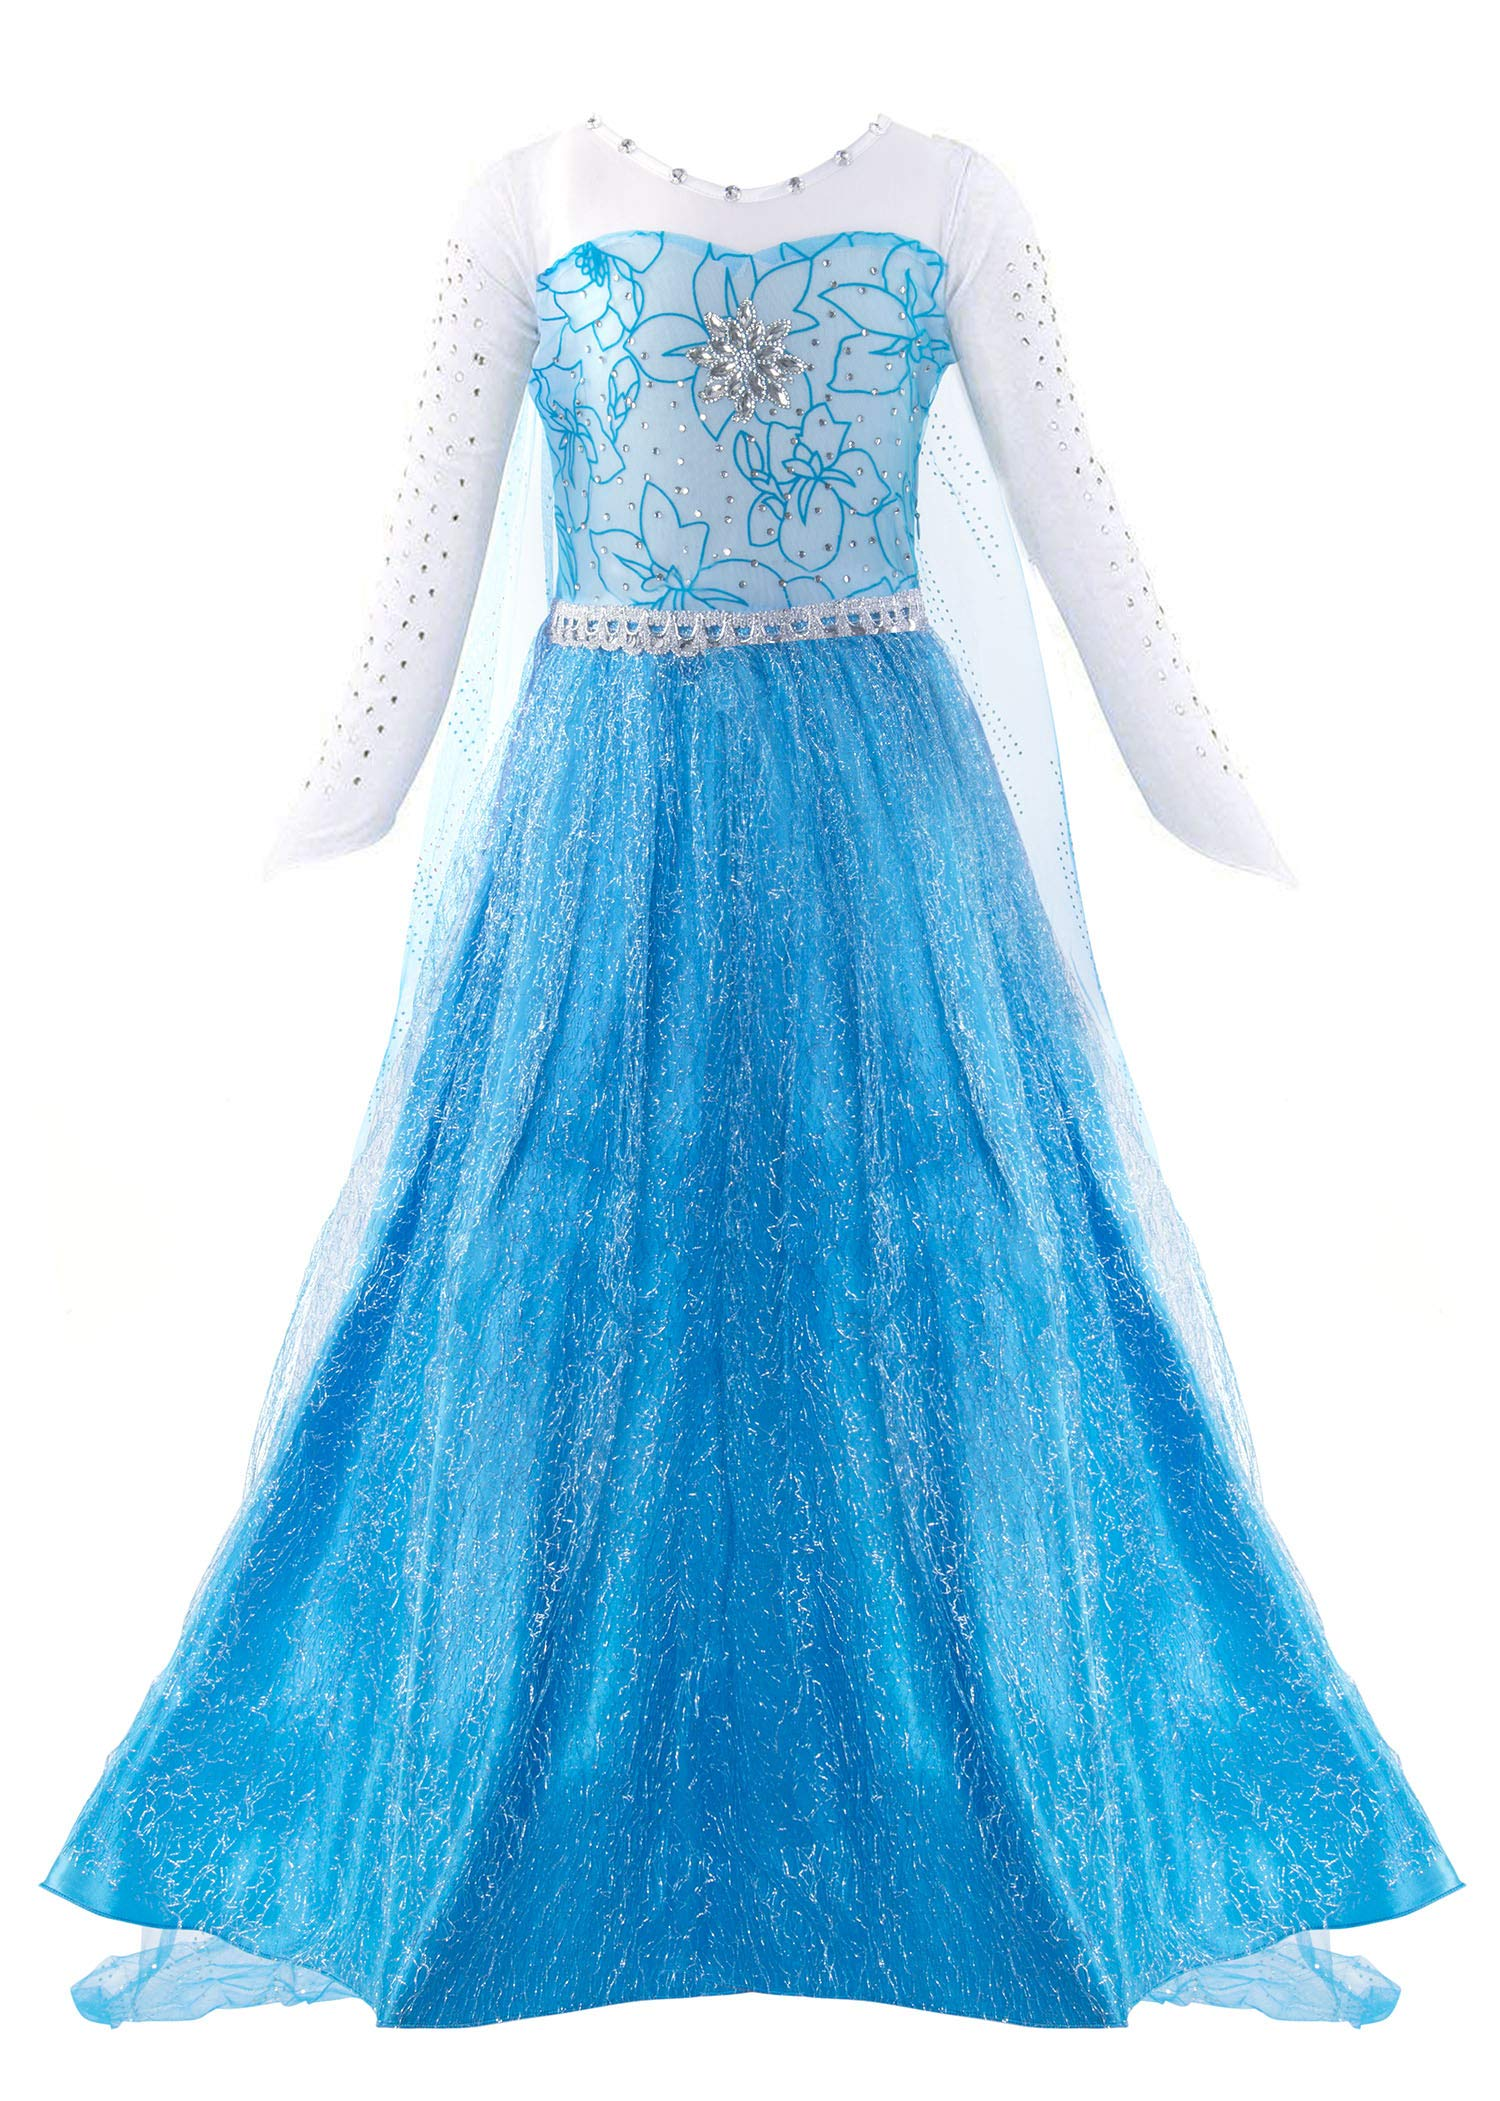 Padete Little Girls Anna Princess Dress Elsa Snow Party Queen Halloween Costume (4 Years, Blue Long Sleeve)